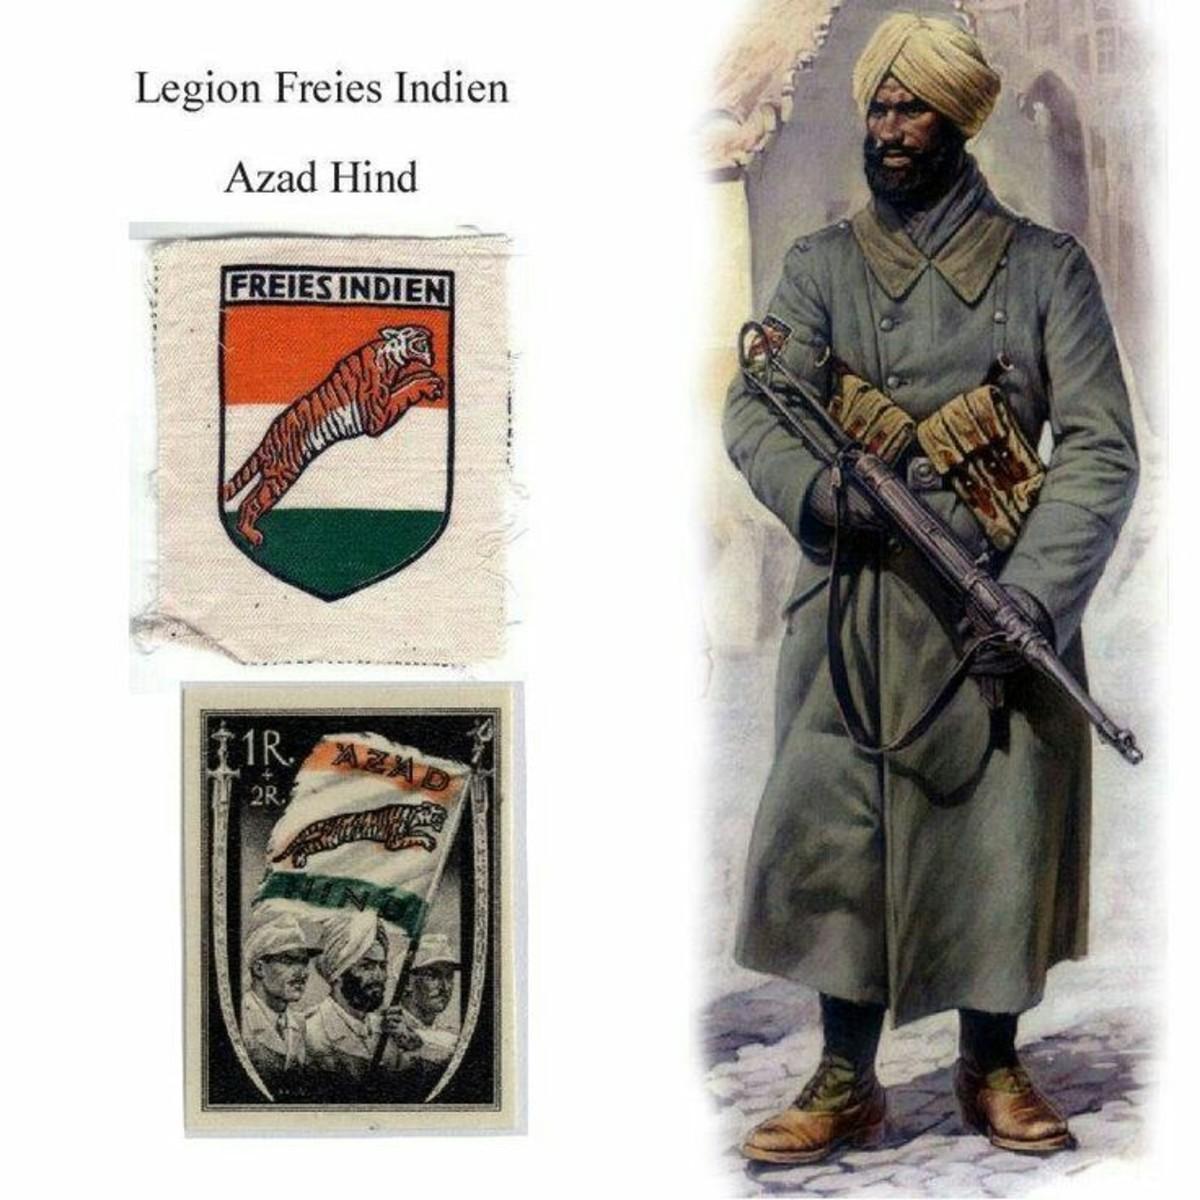 Hitler's India Legion in WW II